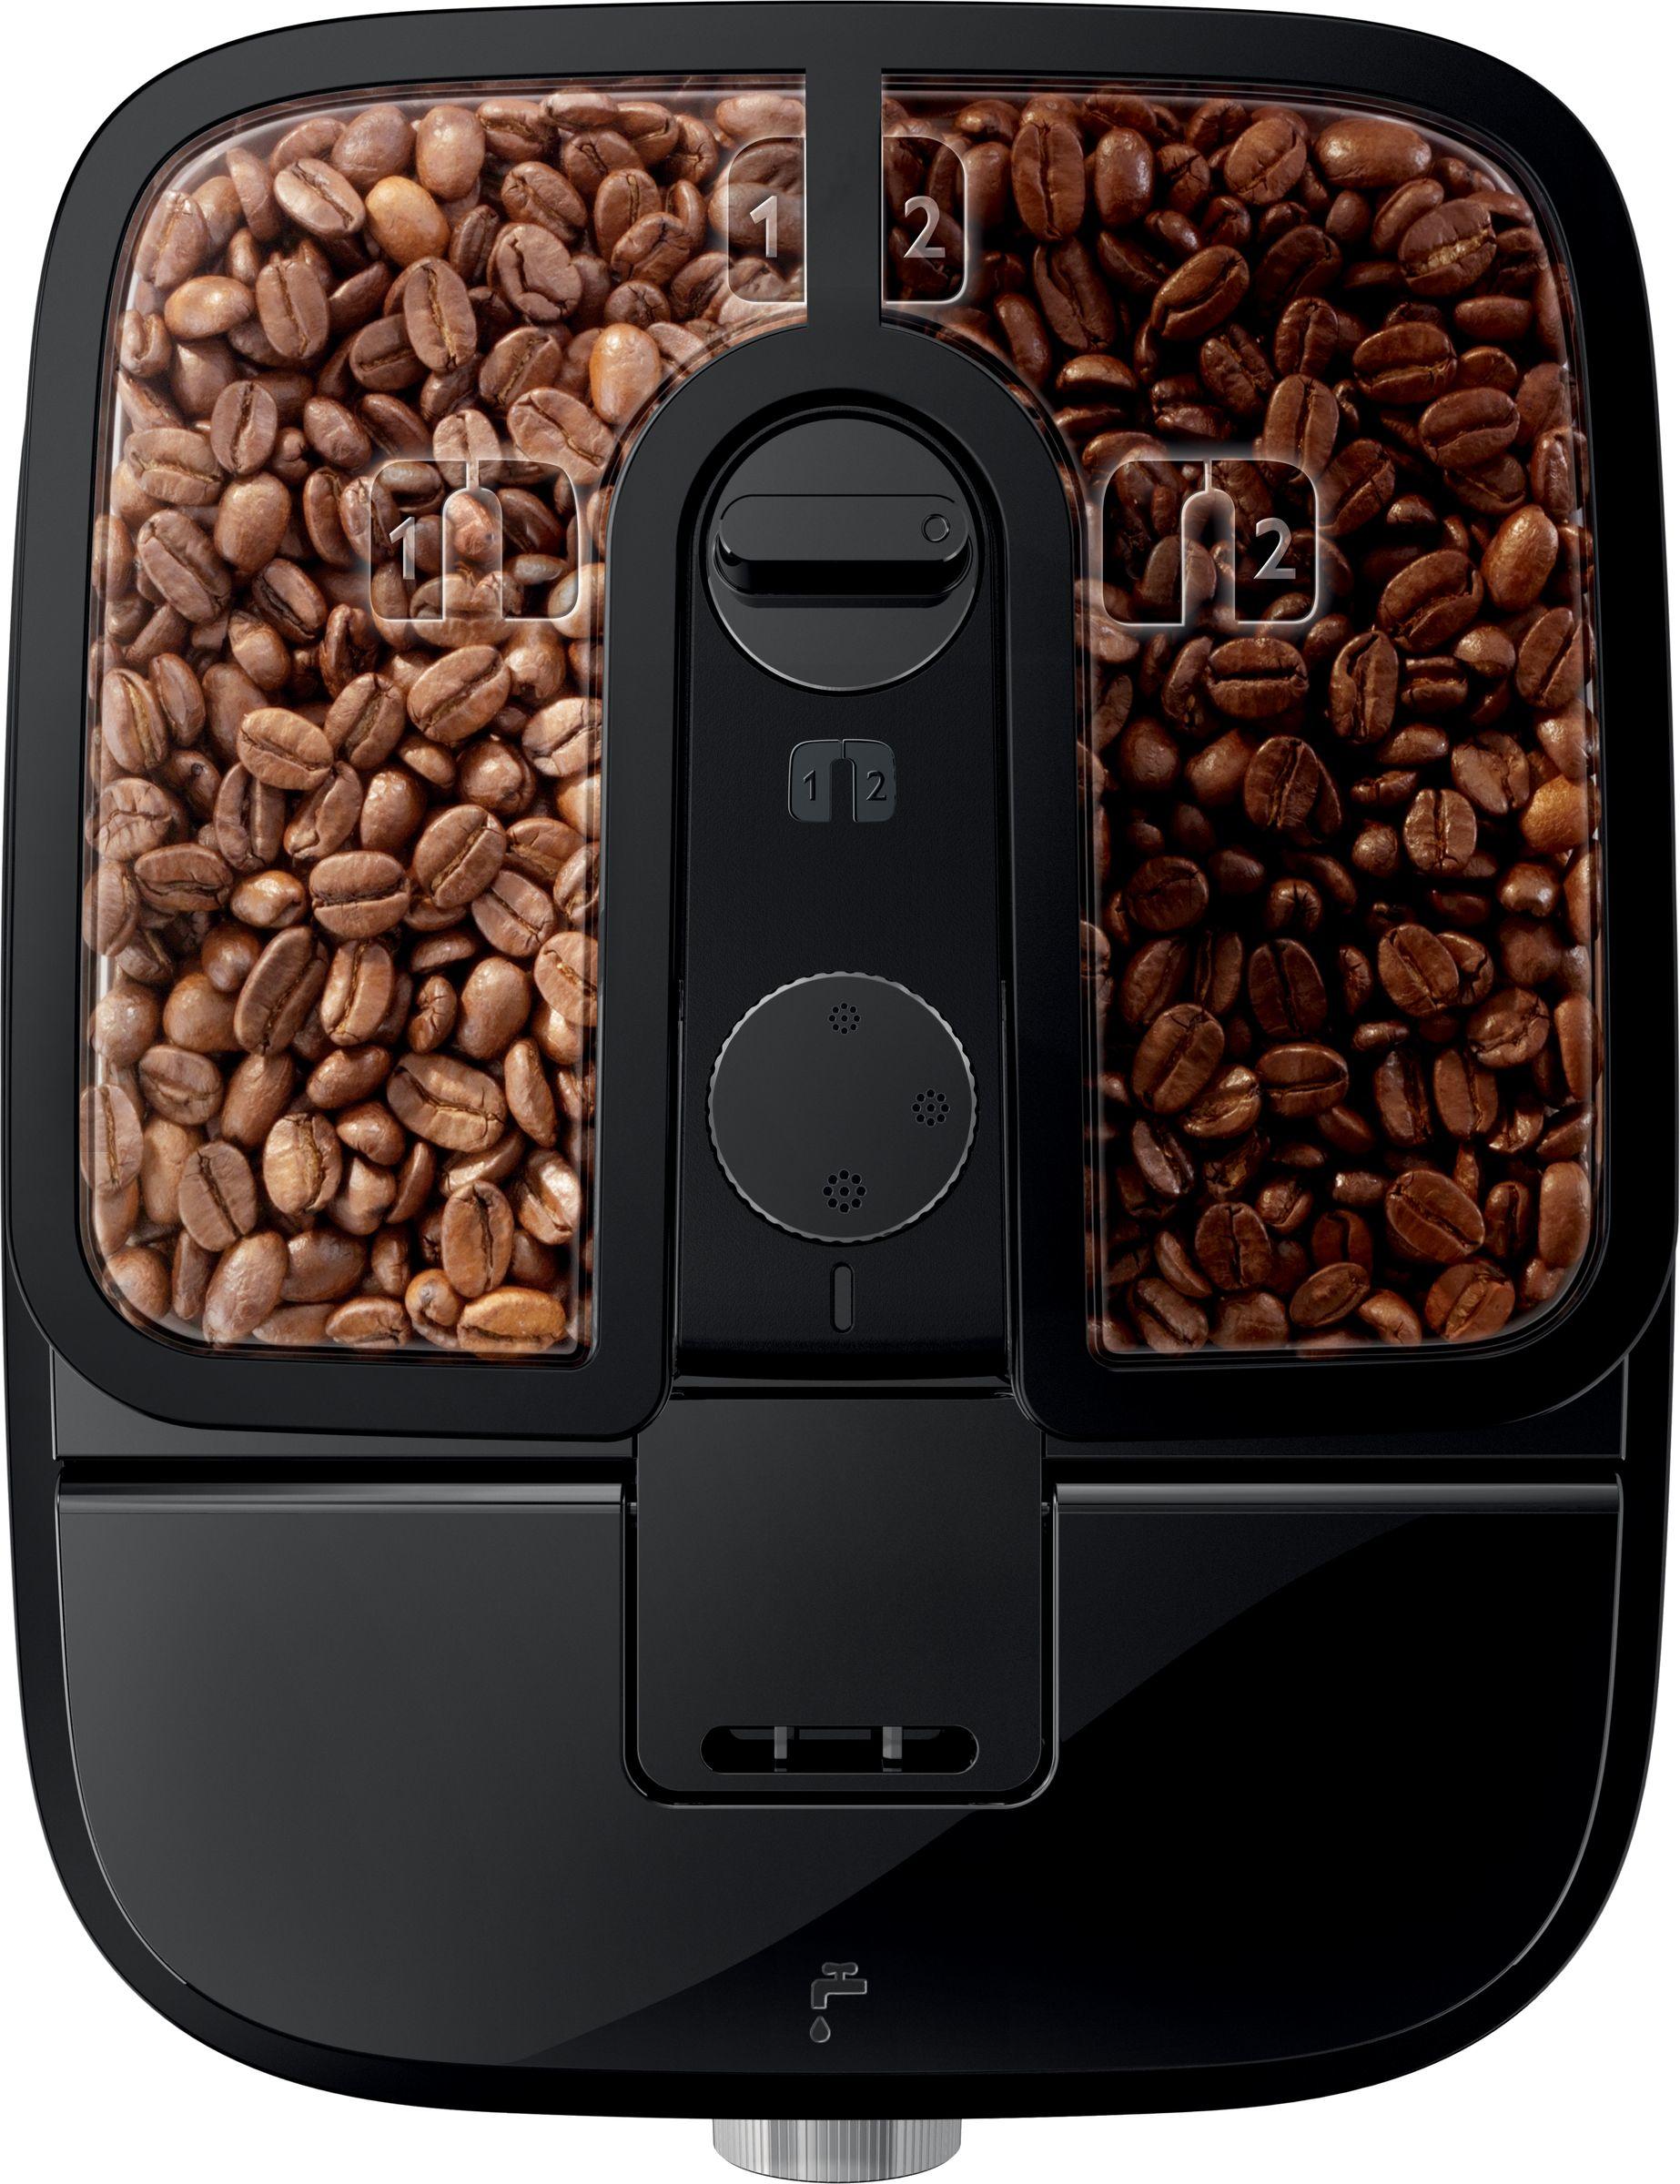 philips grind brew hd7766 00 mahl und br hsystem kaffeemaschine ebay. Black Bedroom Furniture Sets. Home Design Ideas